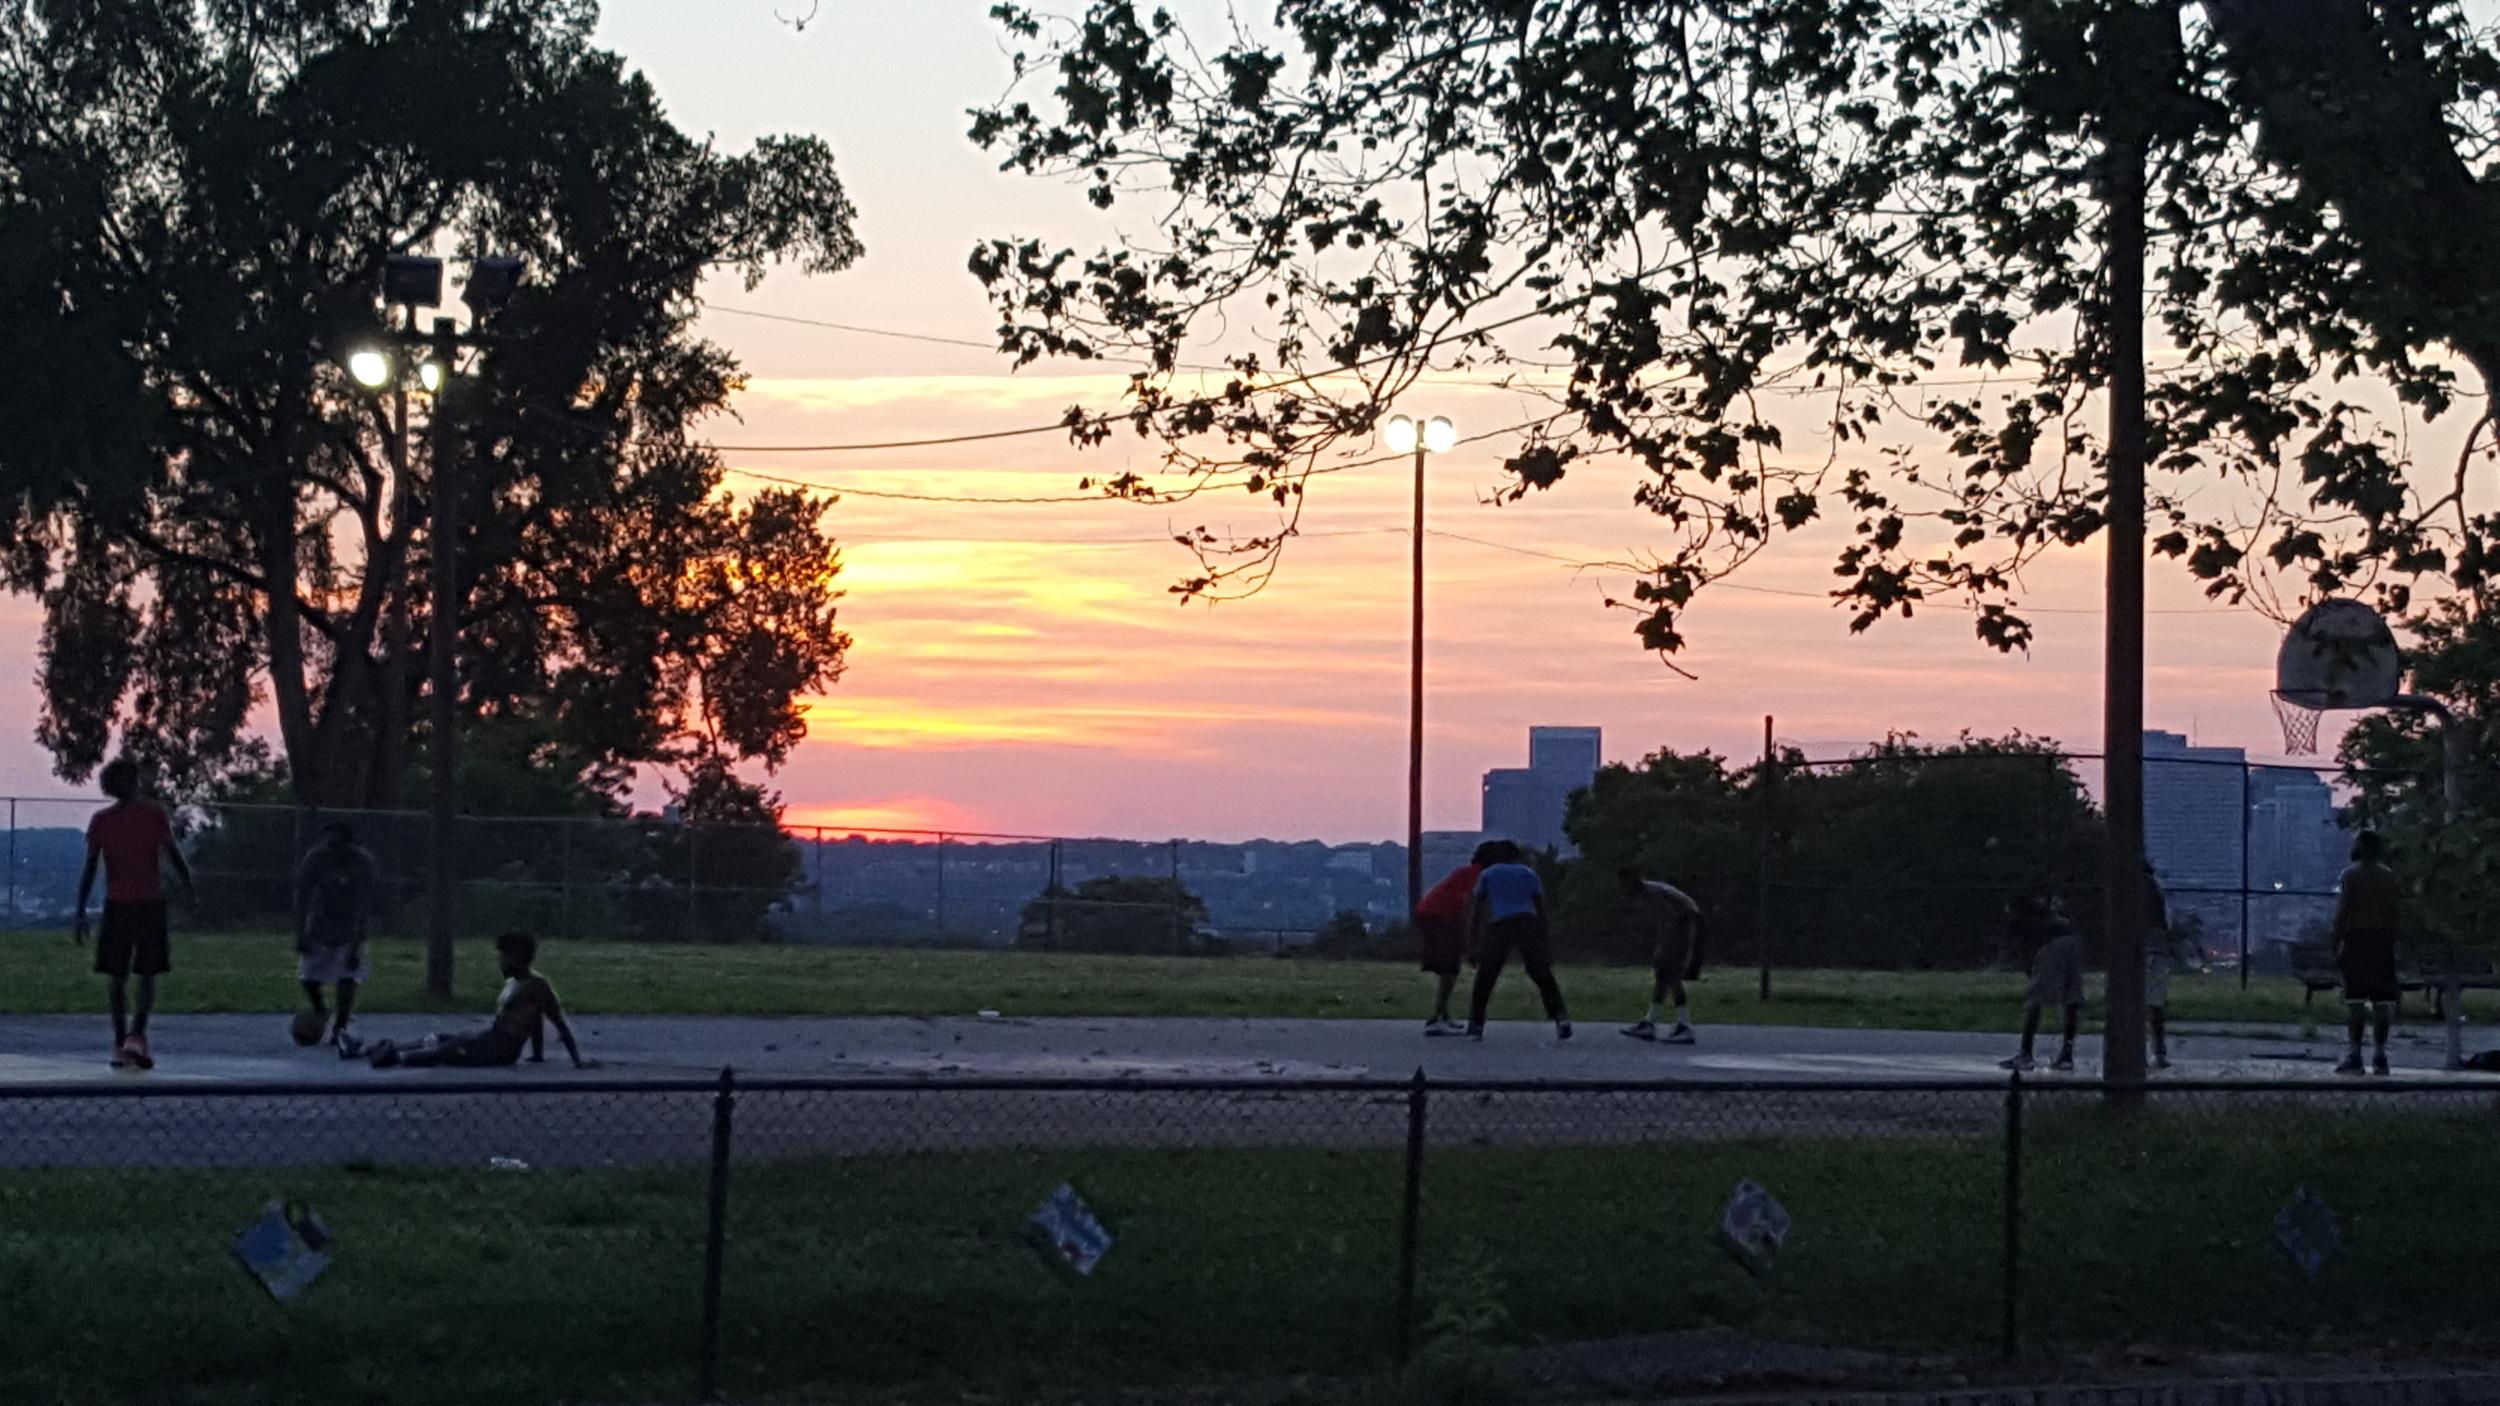 Teens enjoy basketball and an amazing Fulton summer sunset (Photo: M. Zimmerman)